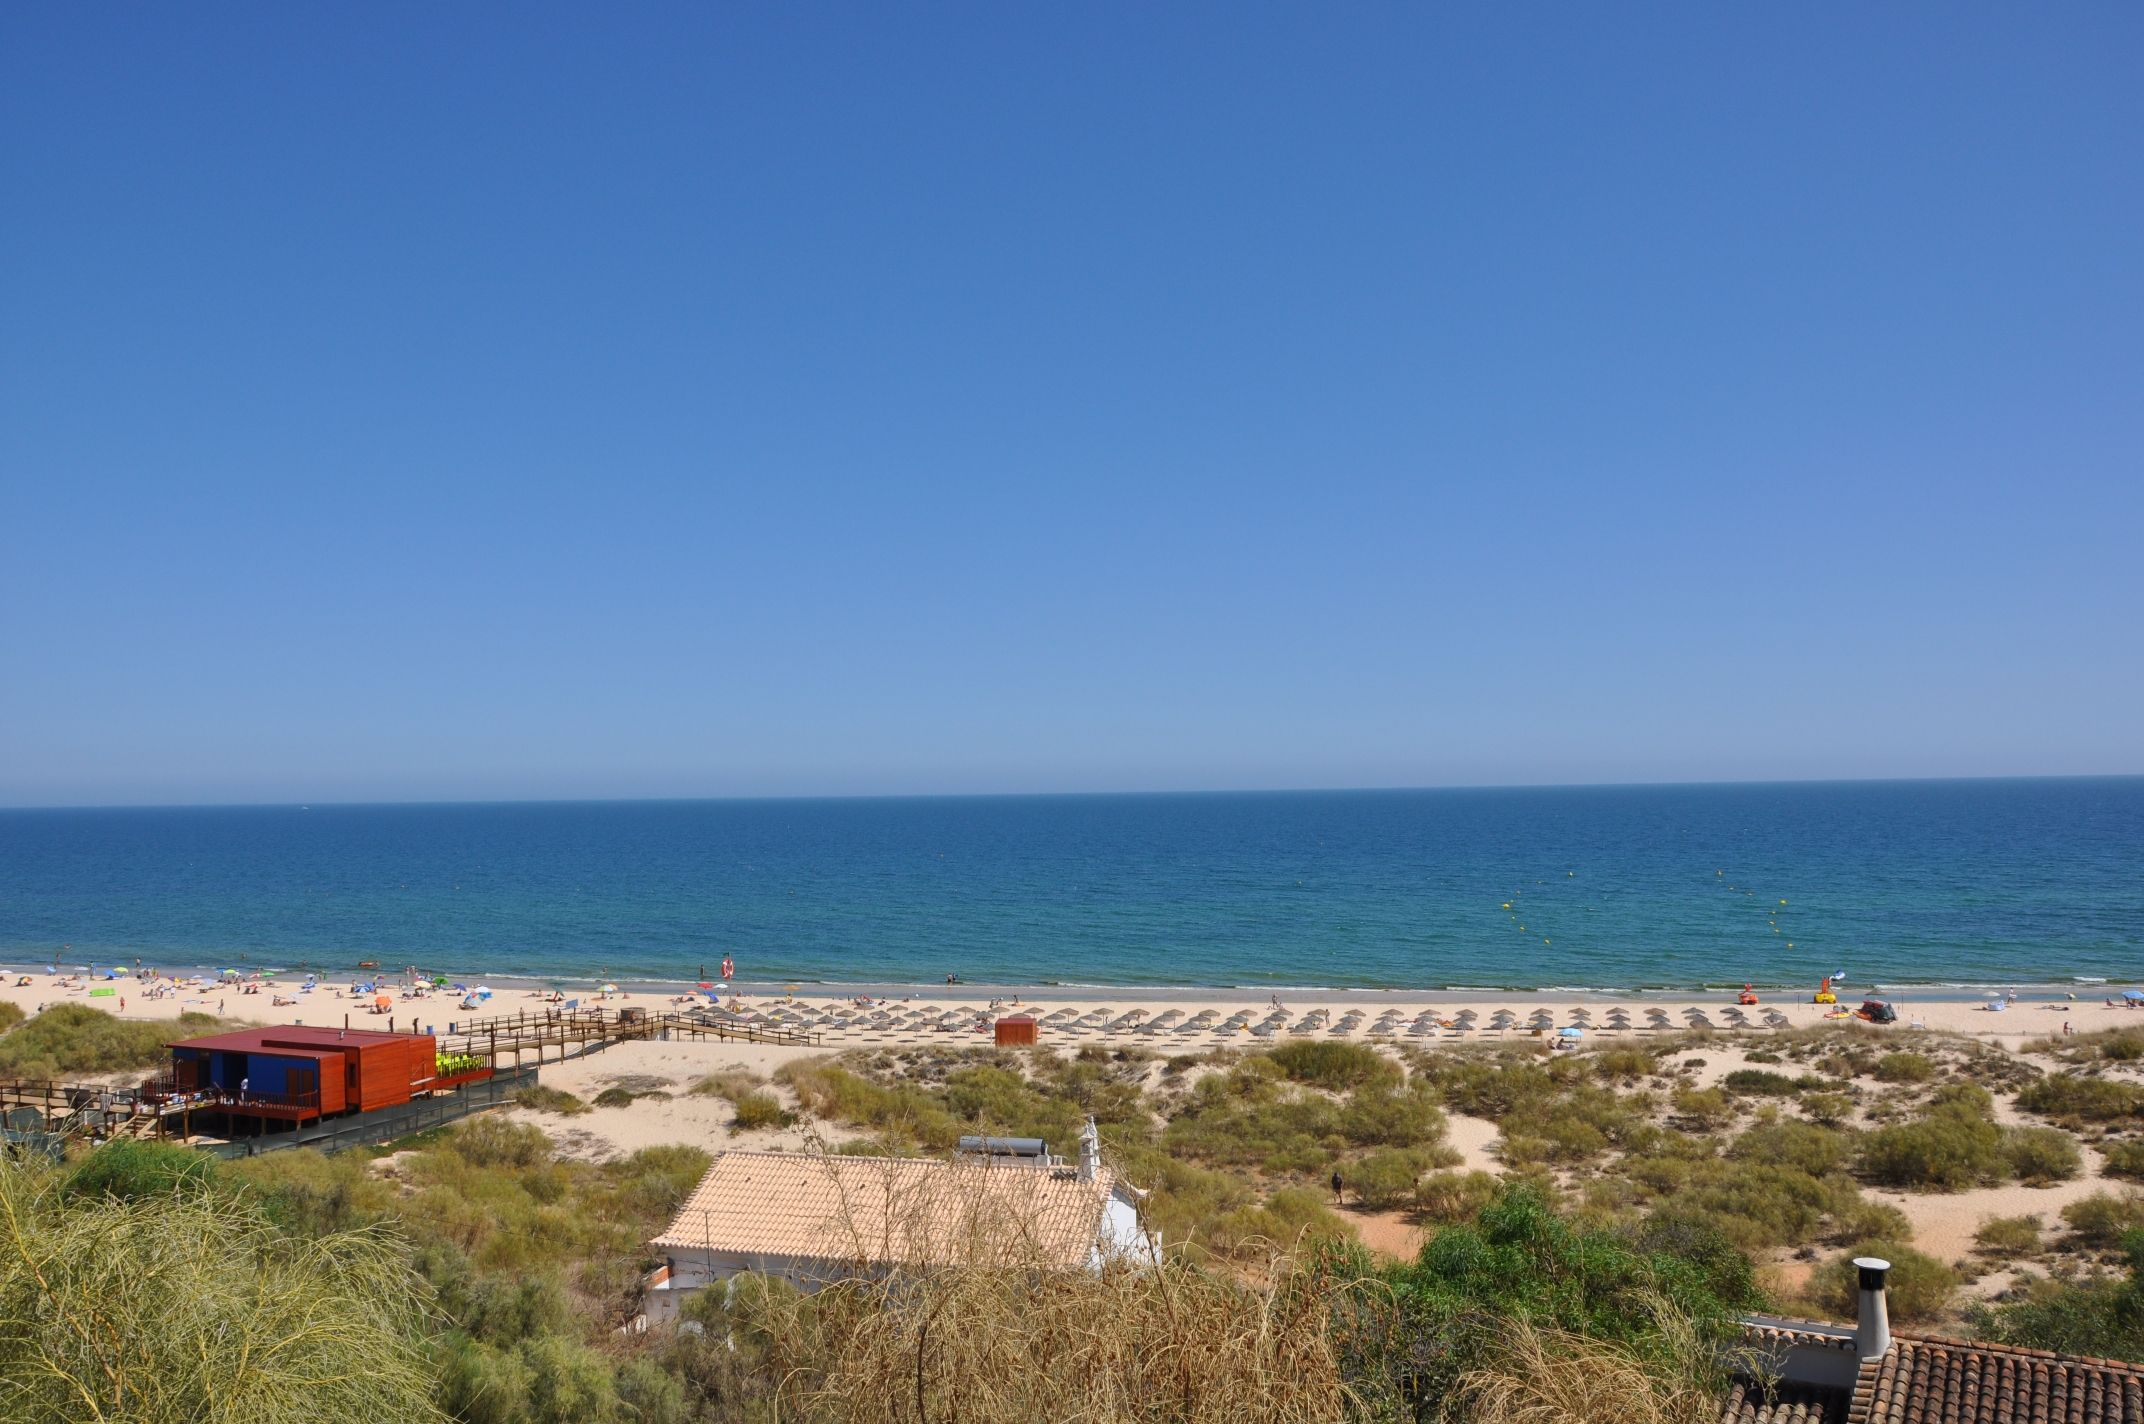 Welcome to Vila Real de Sto António-Algarve Enjoy Portugal Holidays-Cottages & Manor Houses http://www.enjoyportugal.eu/#!algarve/c1ode